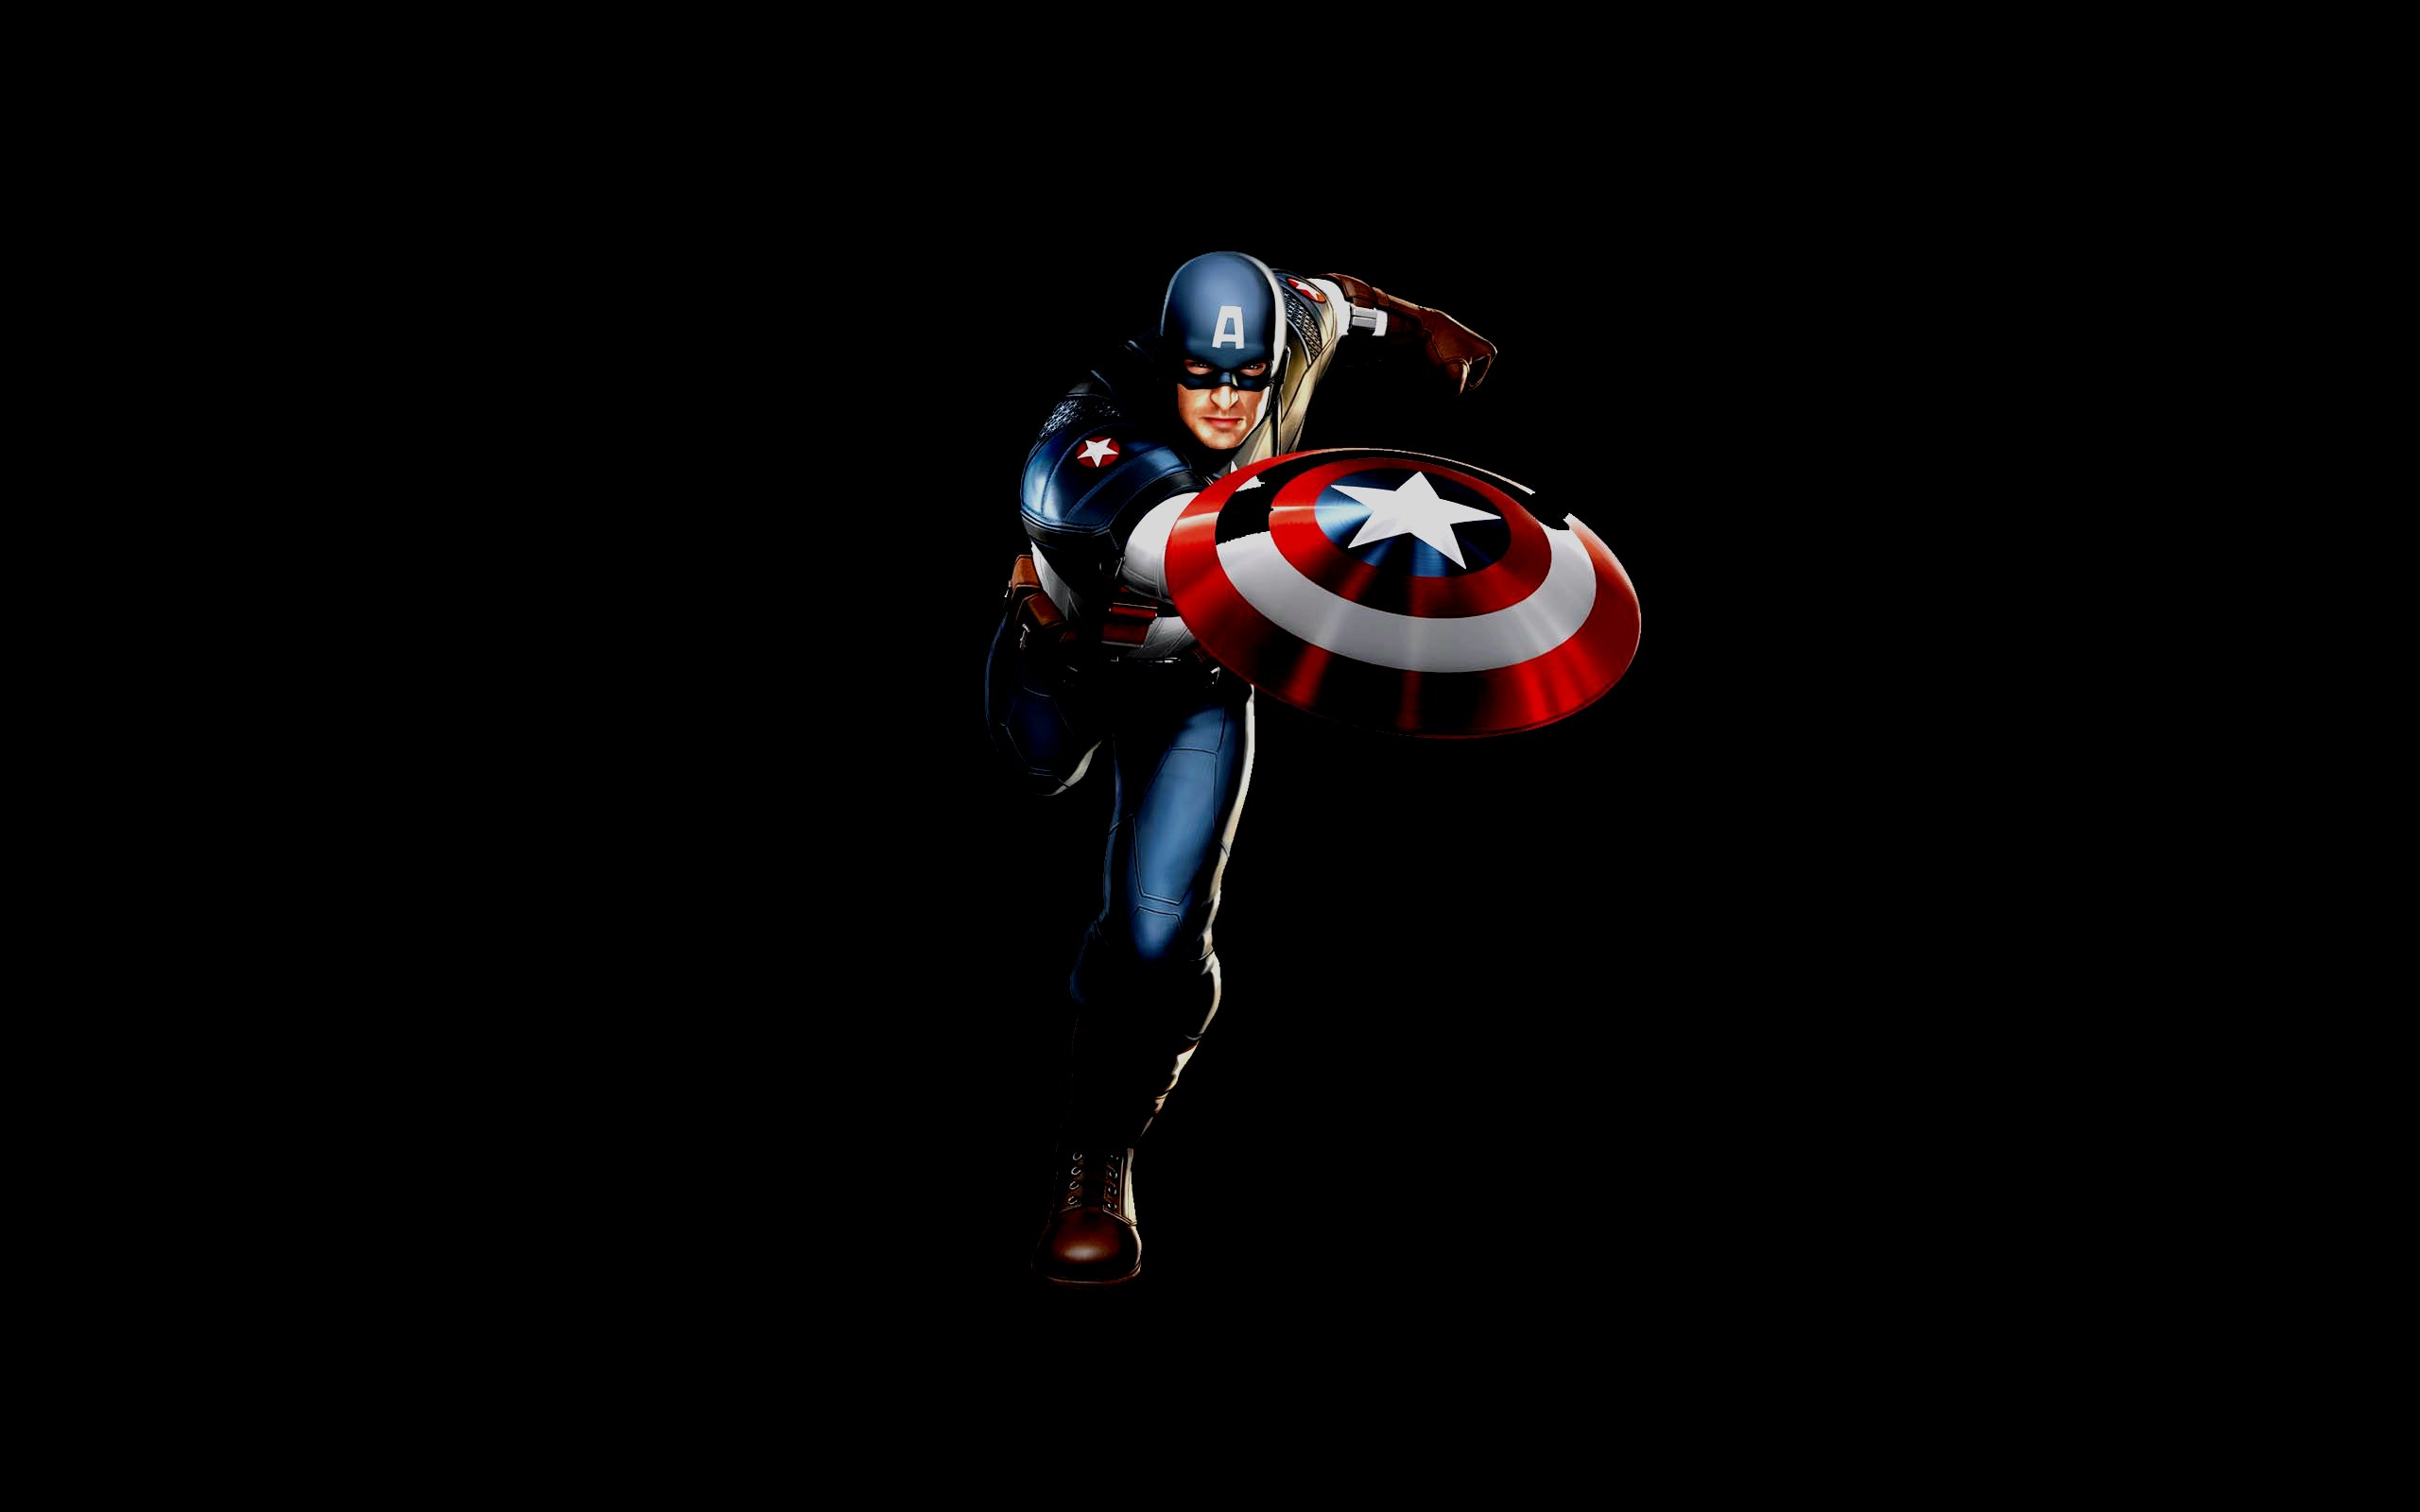 Superhero Captain America Wallpaper Captain America Wallpaper 2560x1600